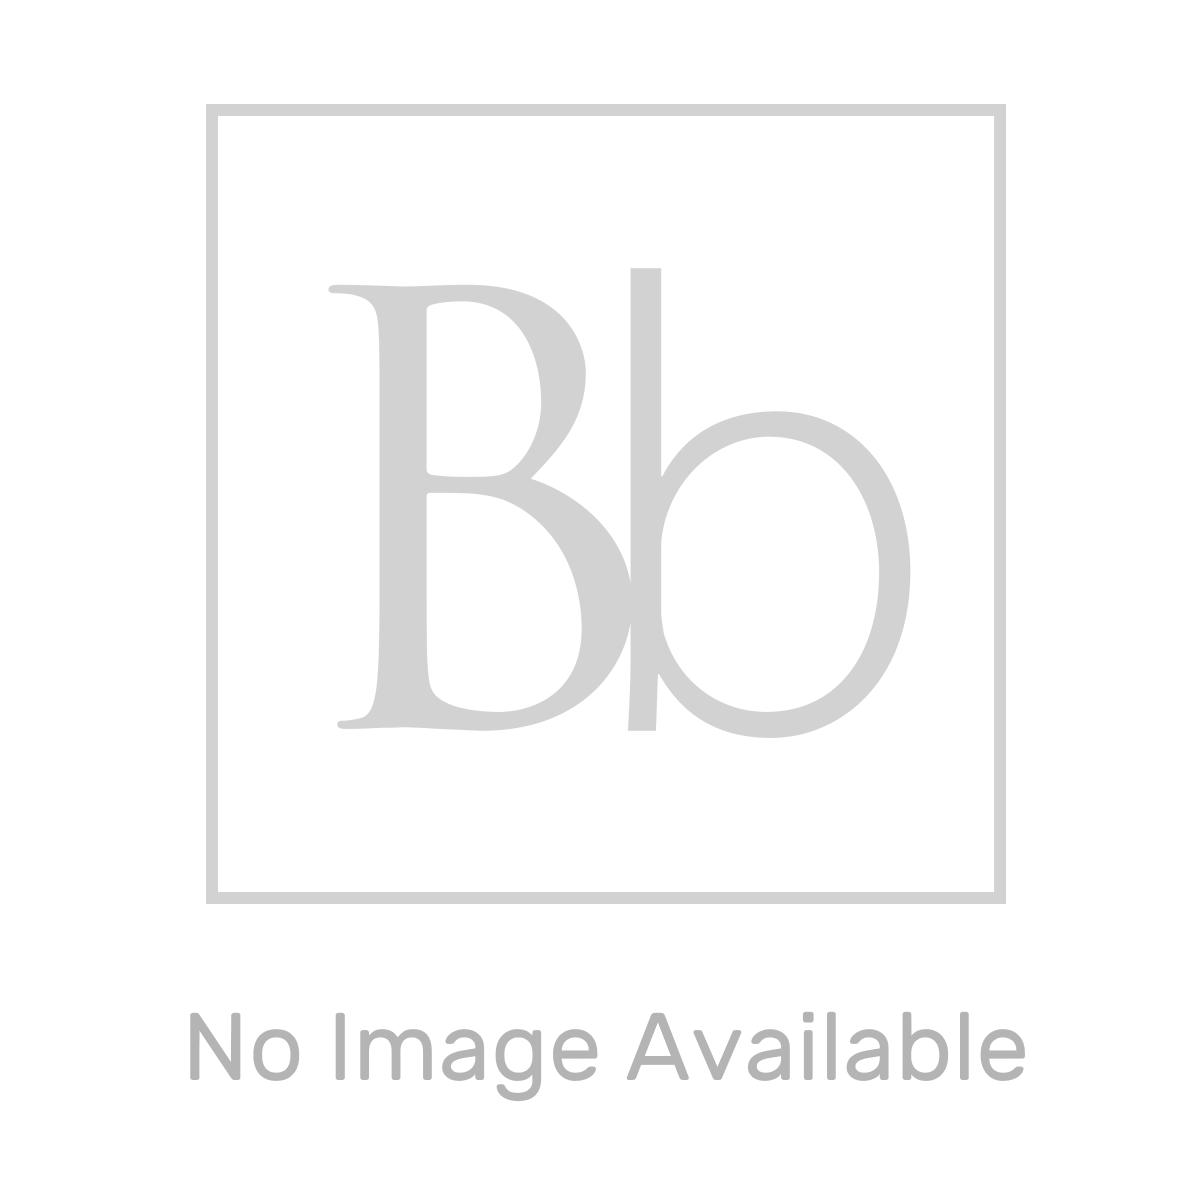 RAK Series 600 1 Tap Hole Basin with Full Pedestal Dimensions